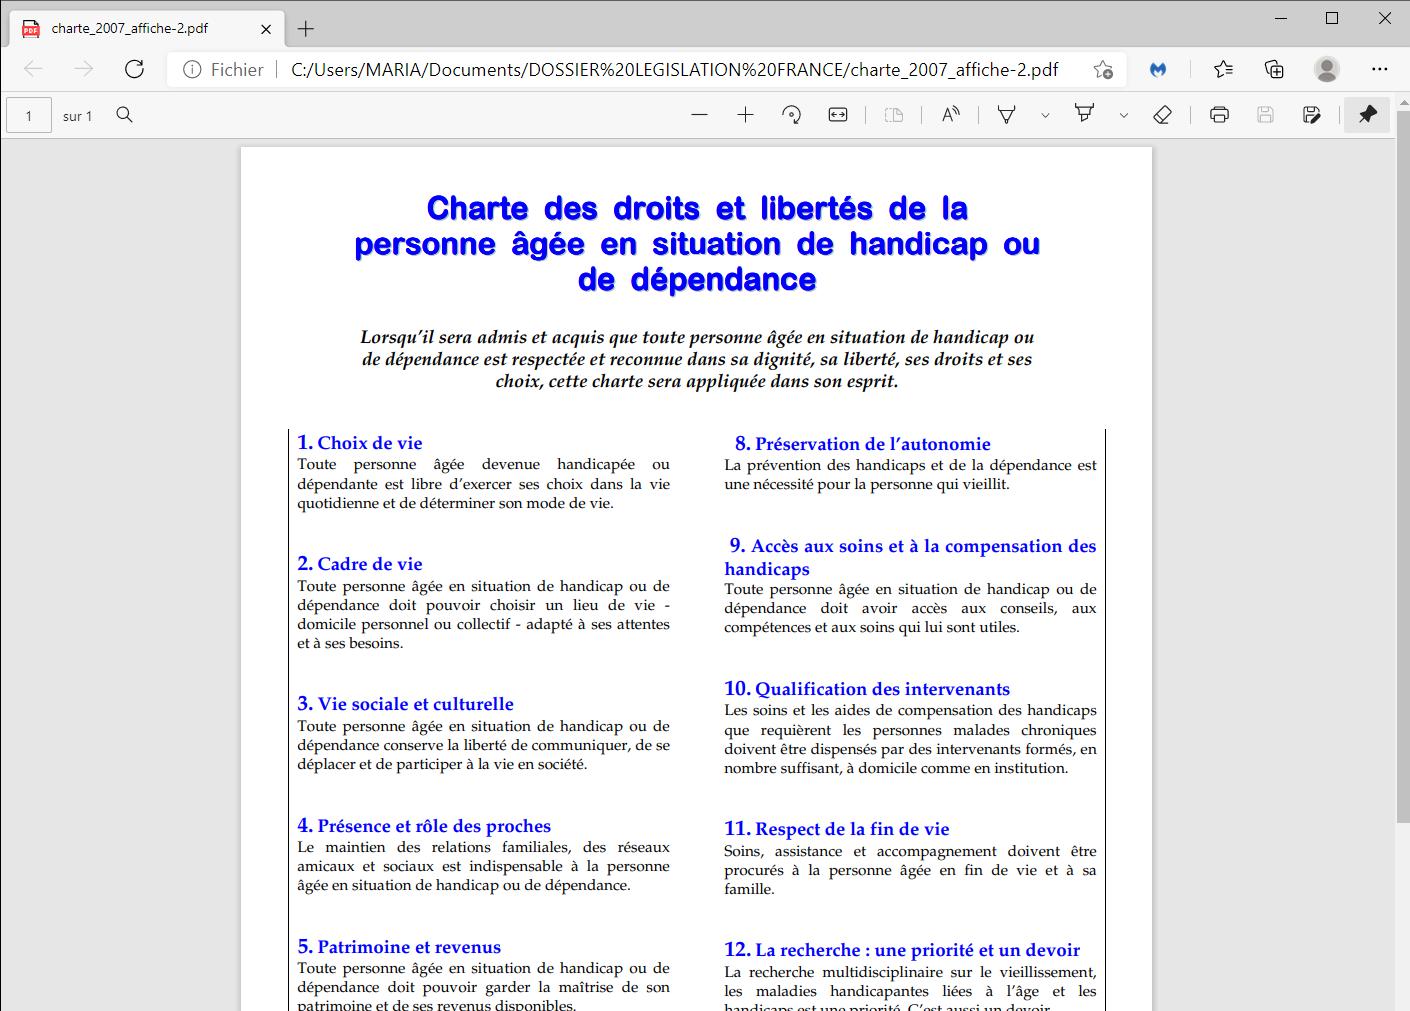 charte_2007_affiche-2.pdf - Personnel - Microsoft Edge 17_02_2021 16_10_54.png